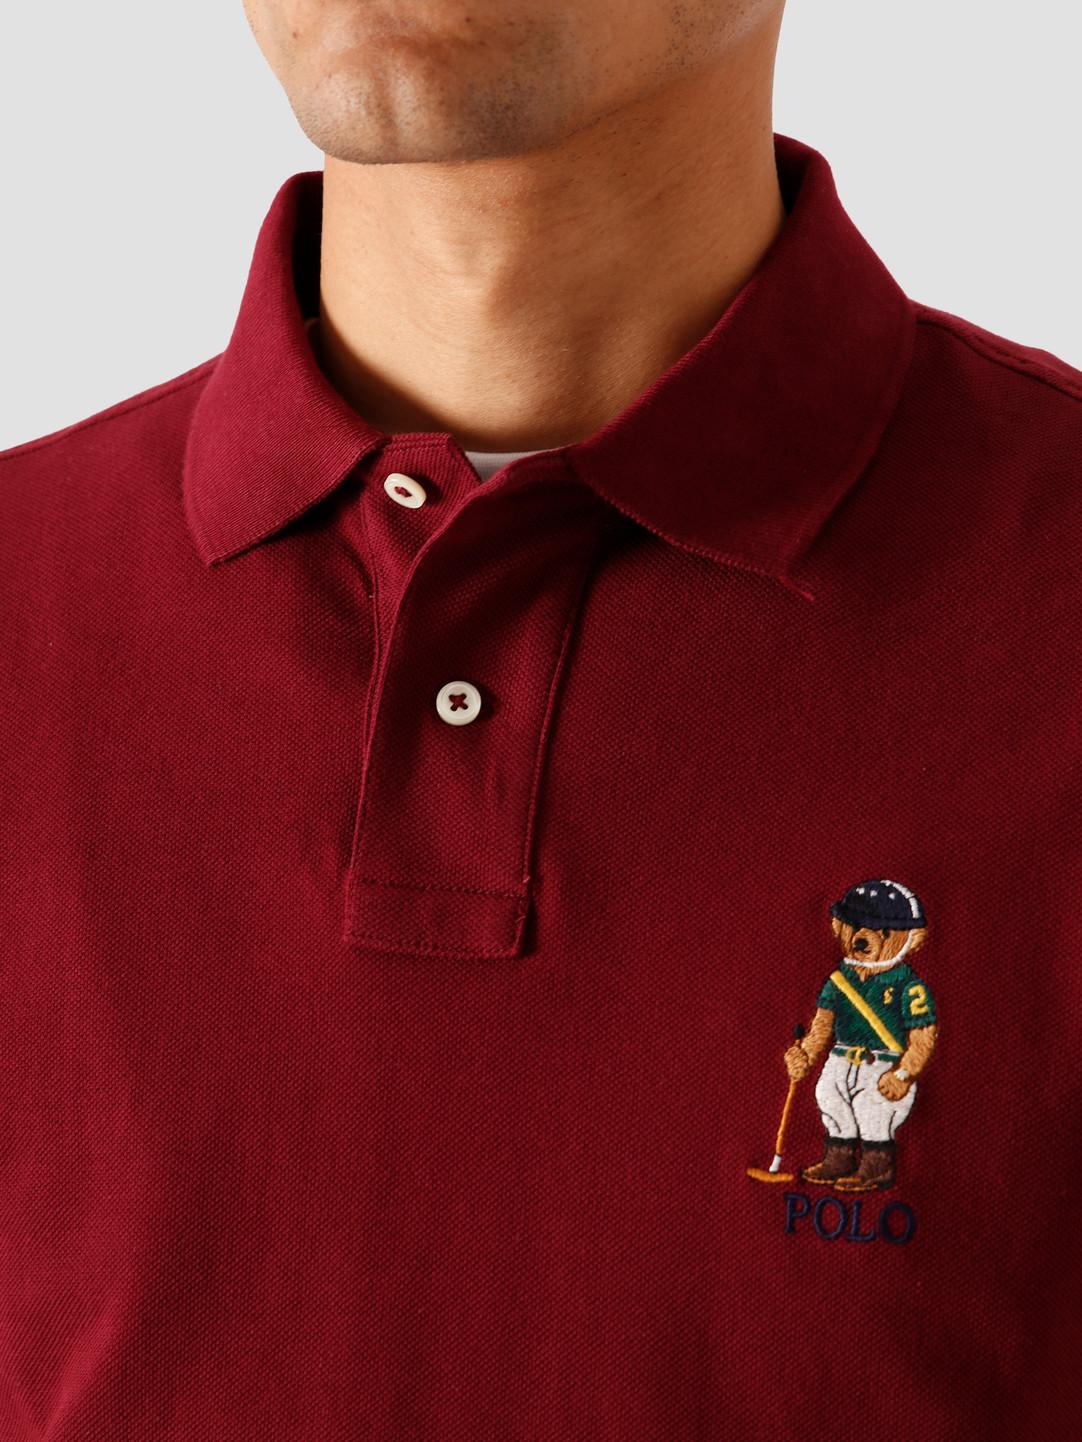 Polo Ralph Lauren Polo Ralph Lauren Basic Mesh T-Shirt Classic Wine 710803538003